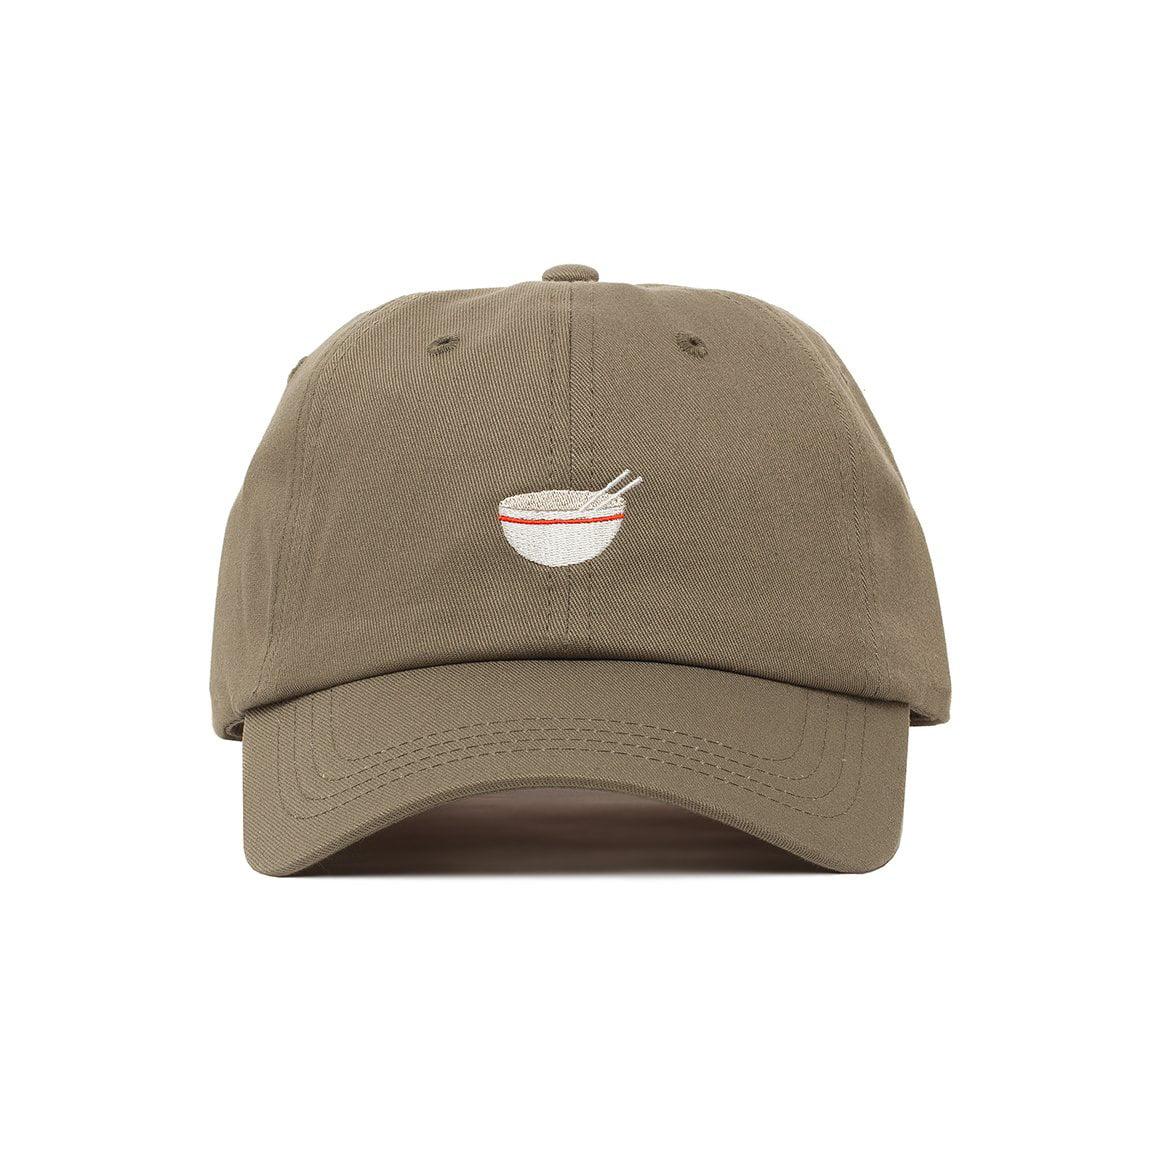 CRSHR - Comfortable Embroidered Noodle Head Dad Hat - Baseball Cap    Baseball Hat - Walmart.com 02a2498e483